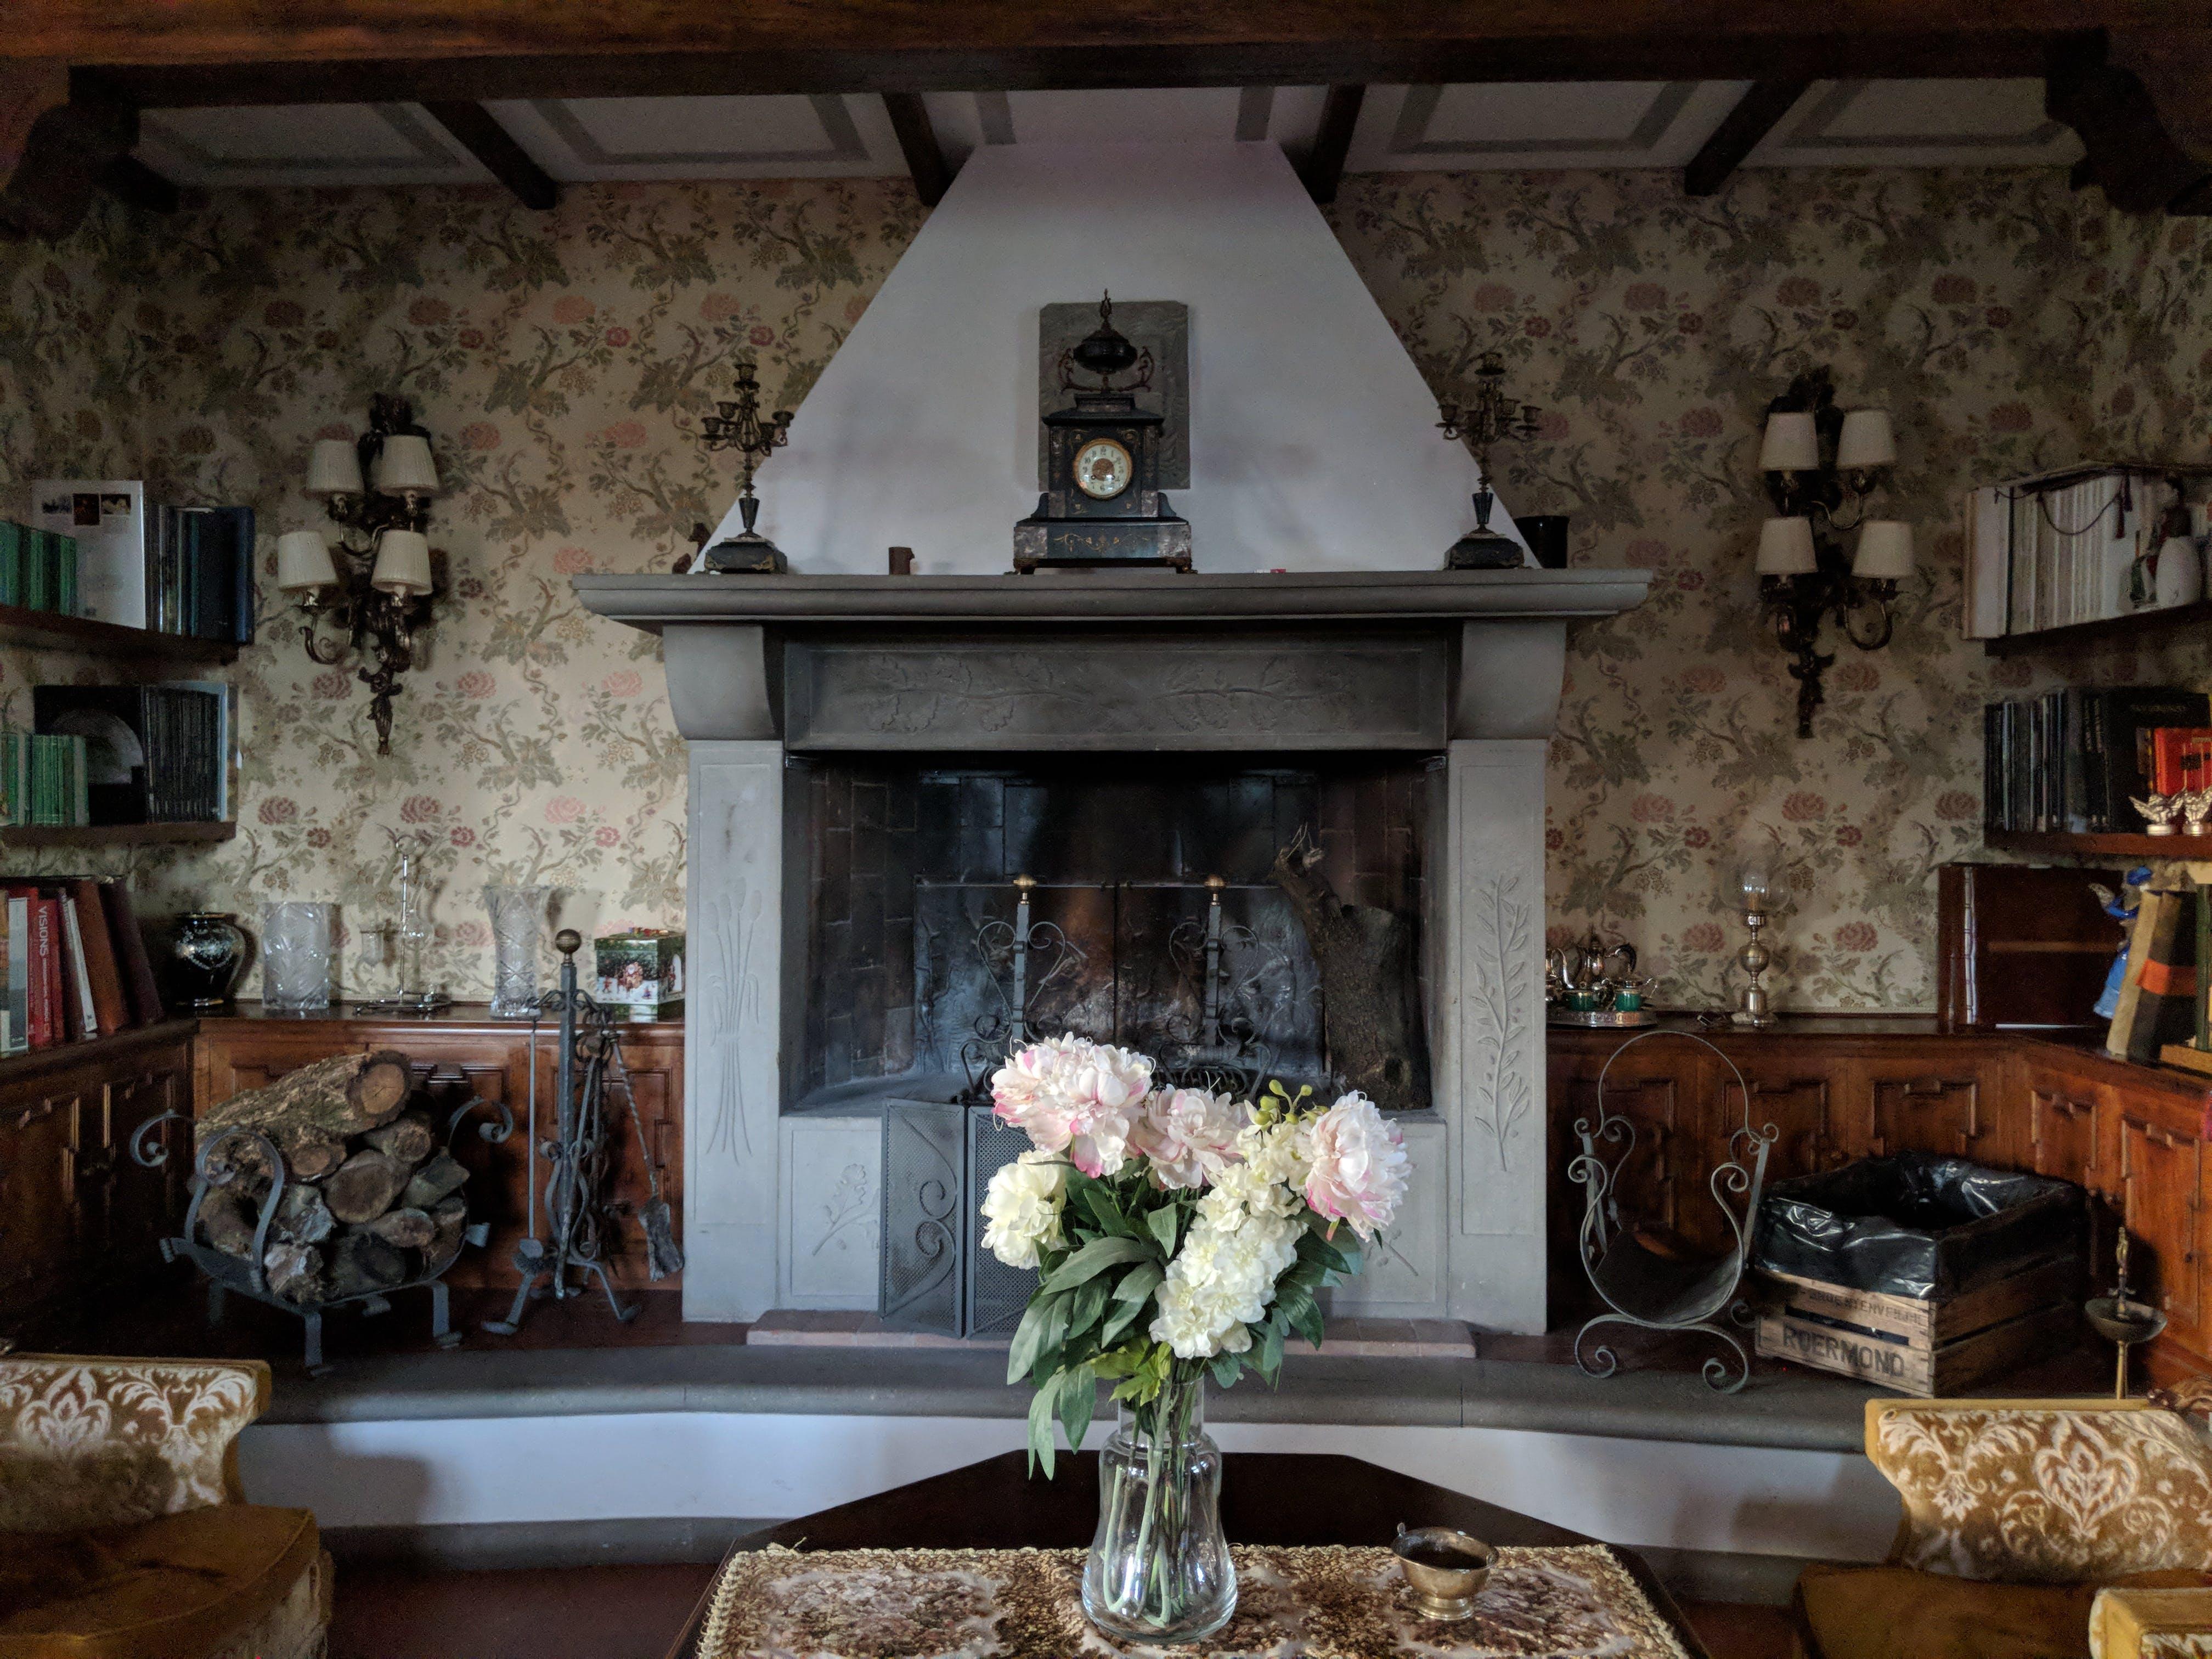 Free stock photo of wood, italian, flowers, books